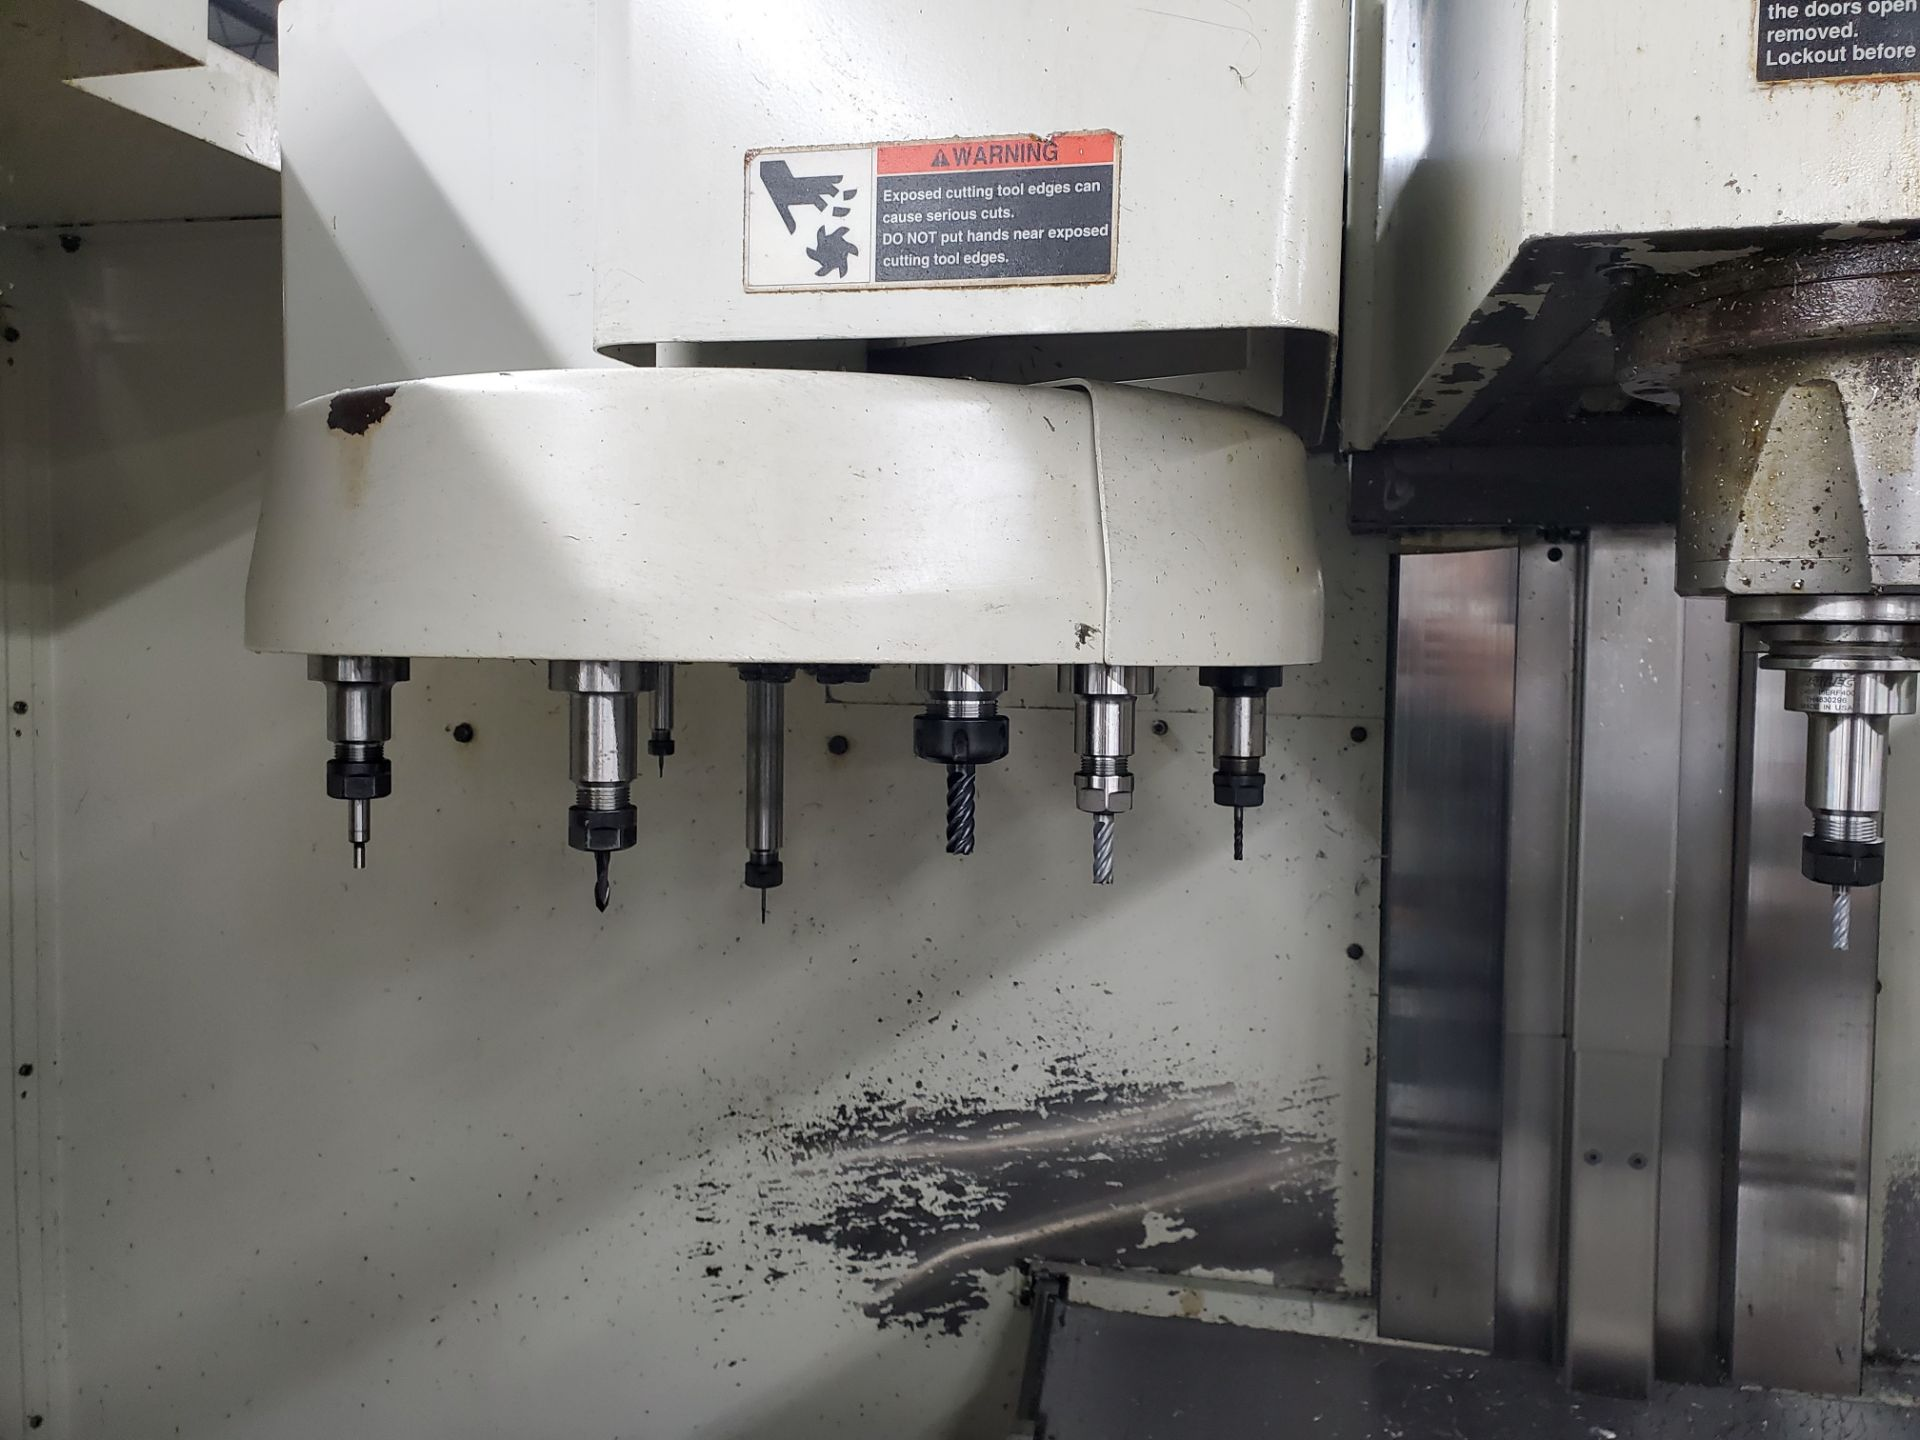 Fadal CNC Vertical Machining Center Model 4020 - Image 14 of 18